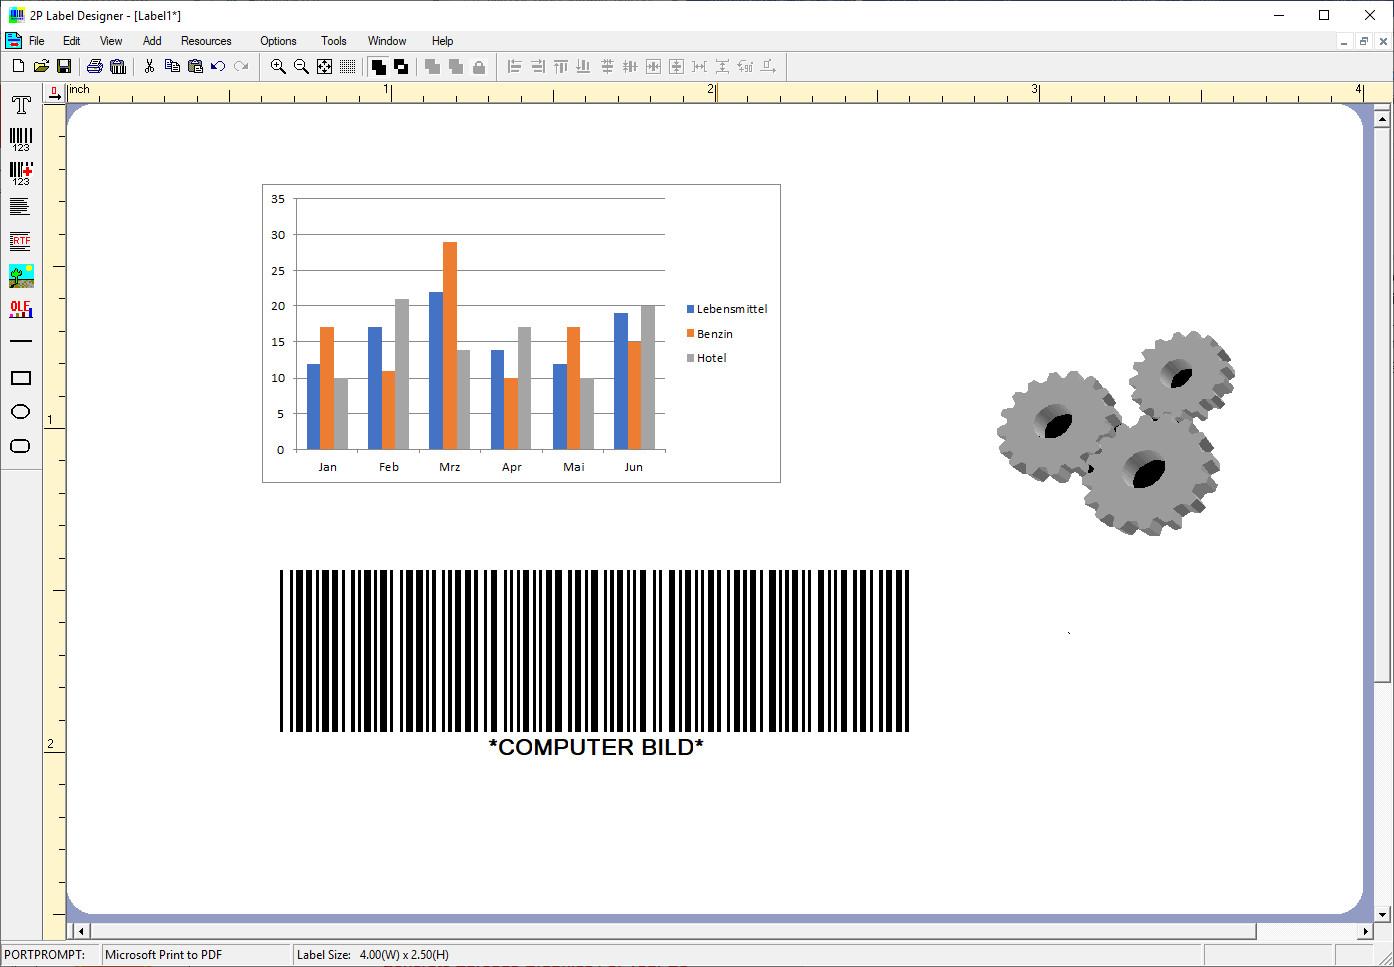 Screenshot 1 - 2P Label Designer